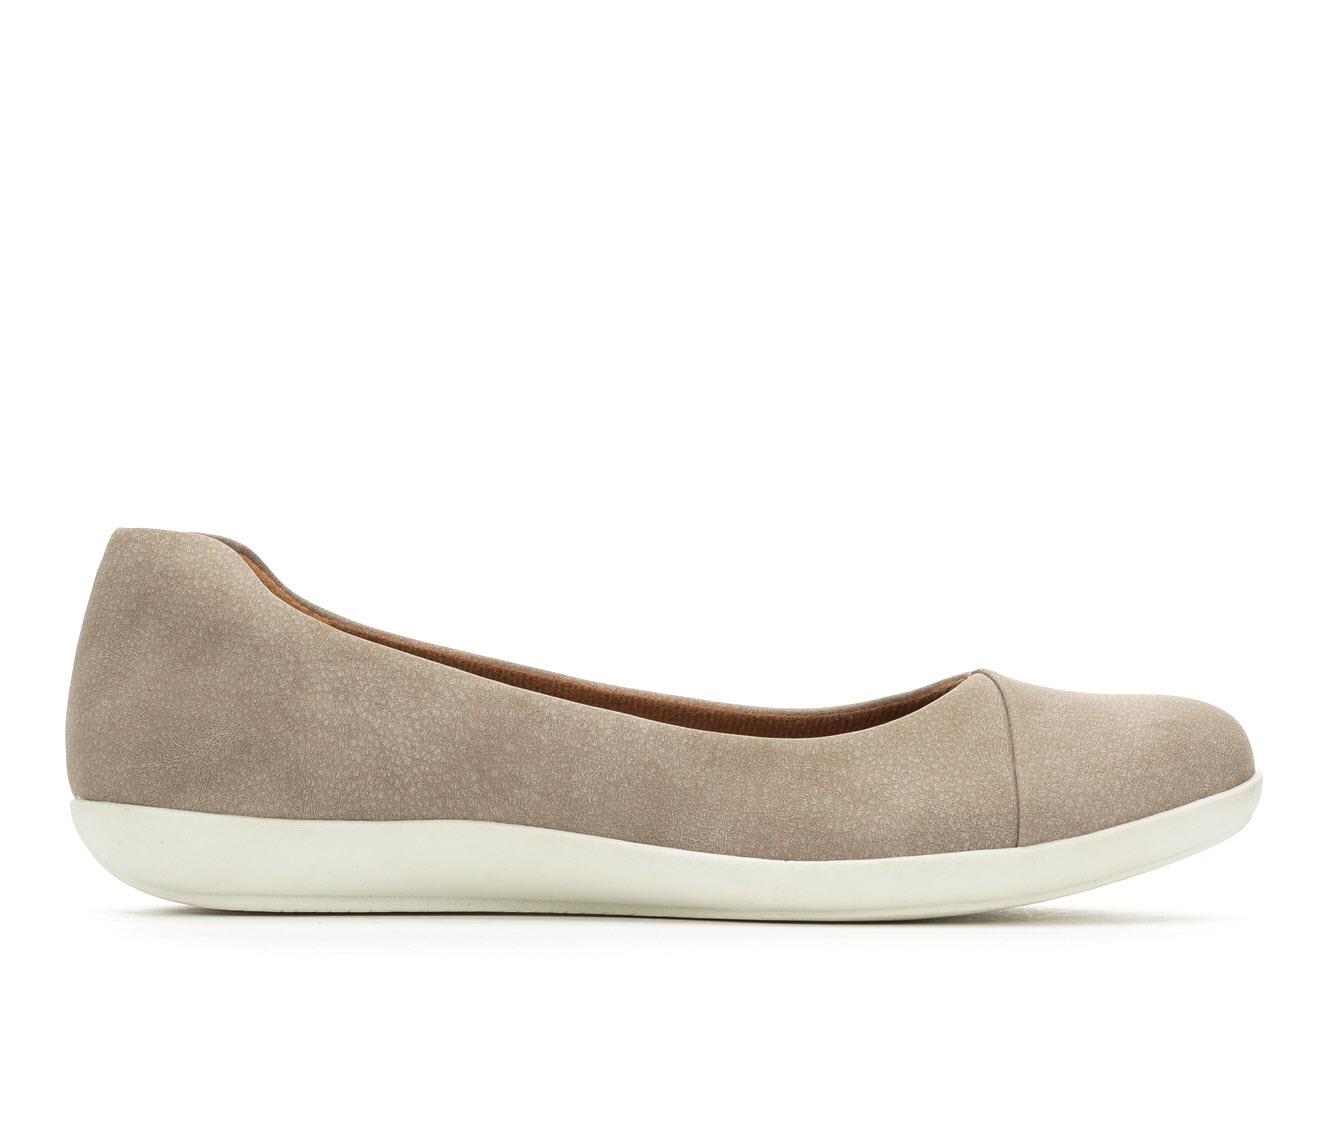 EuroSoft Manila Women's Shoe (Gray Faux Leather)